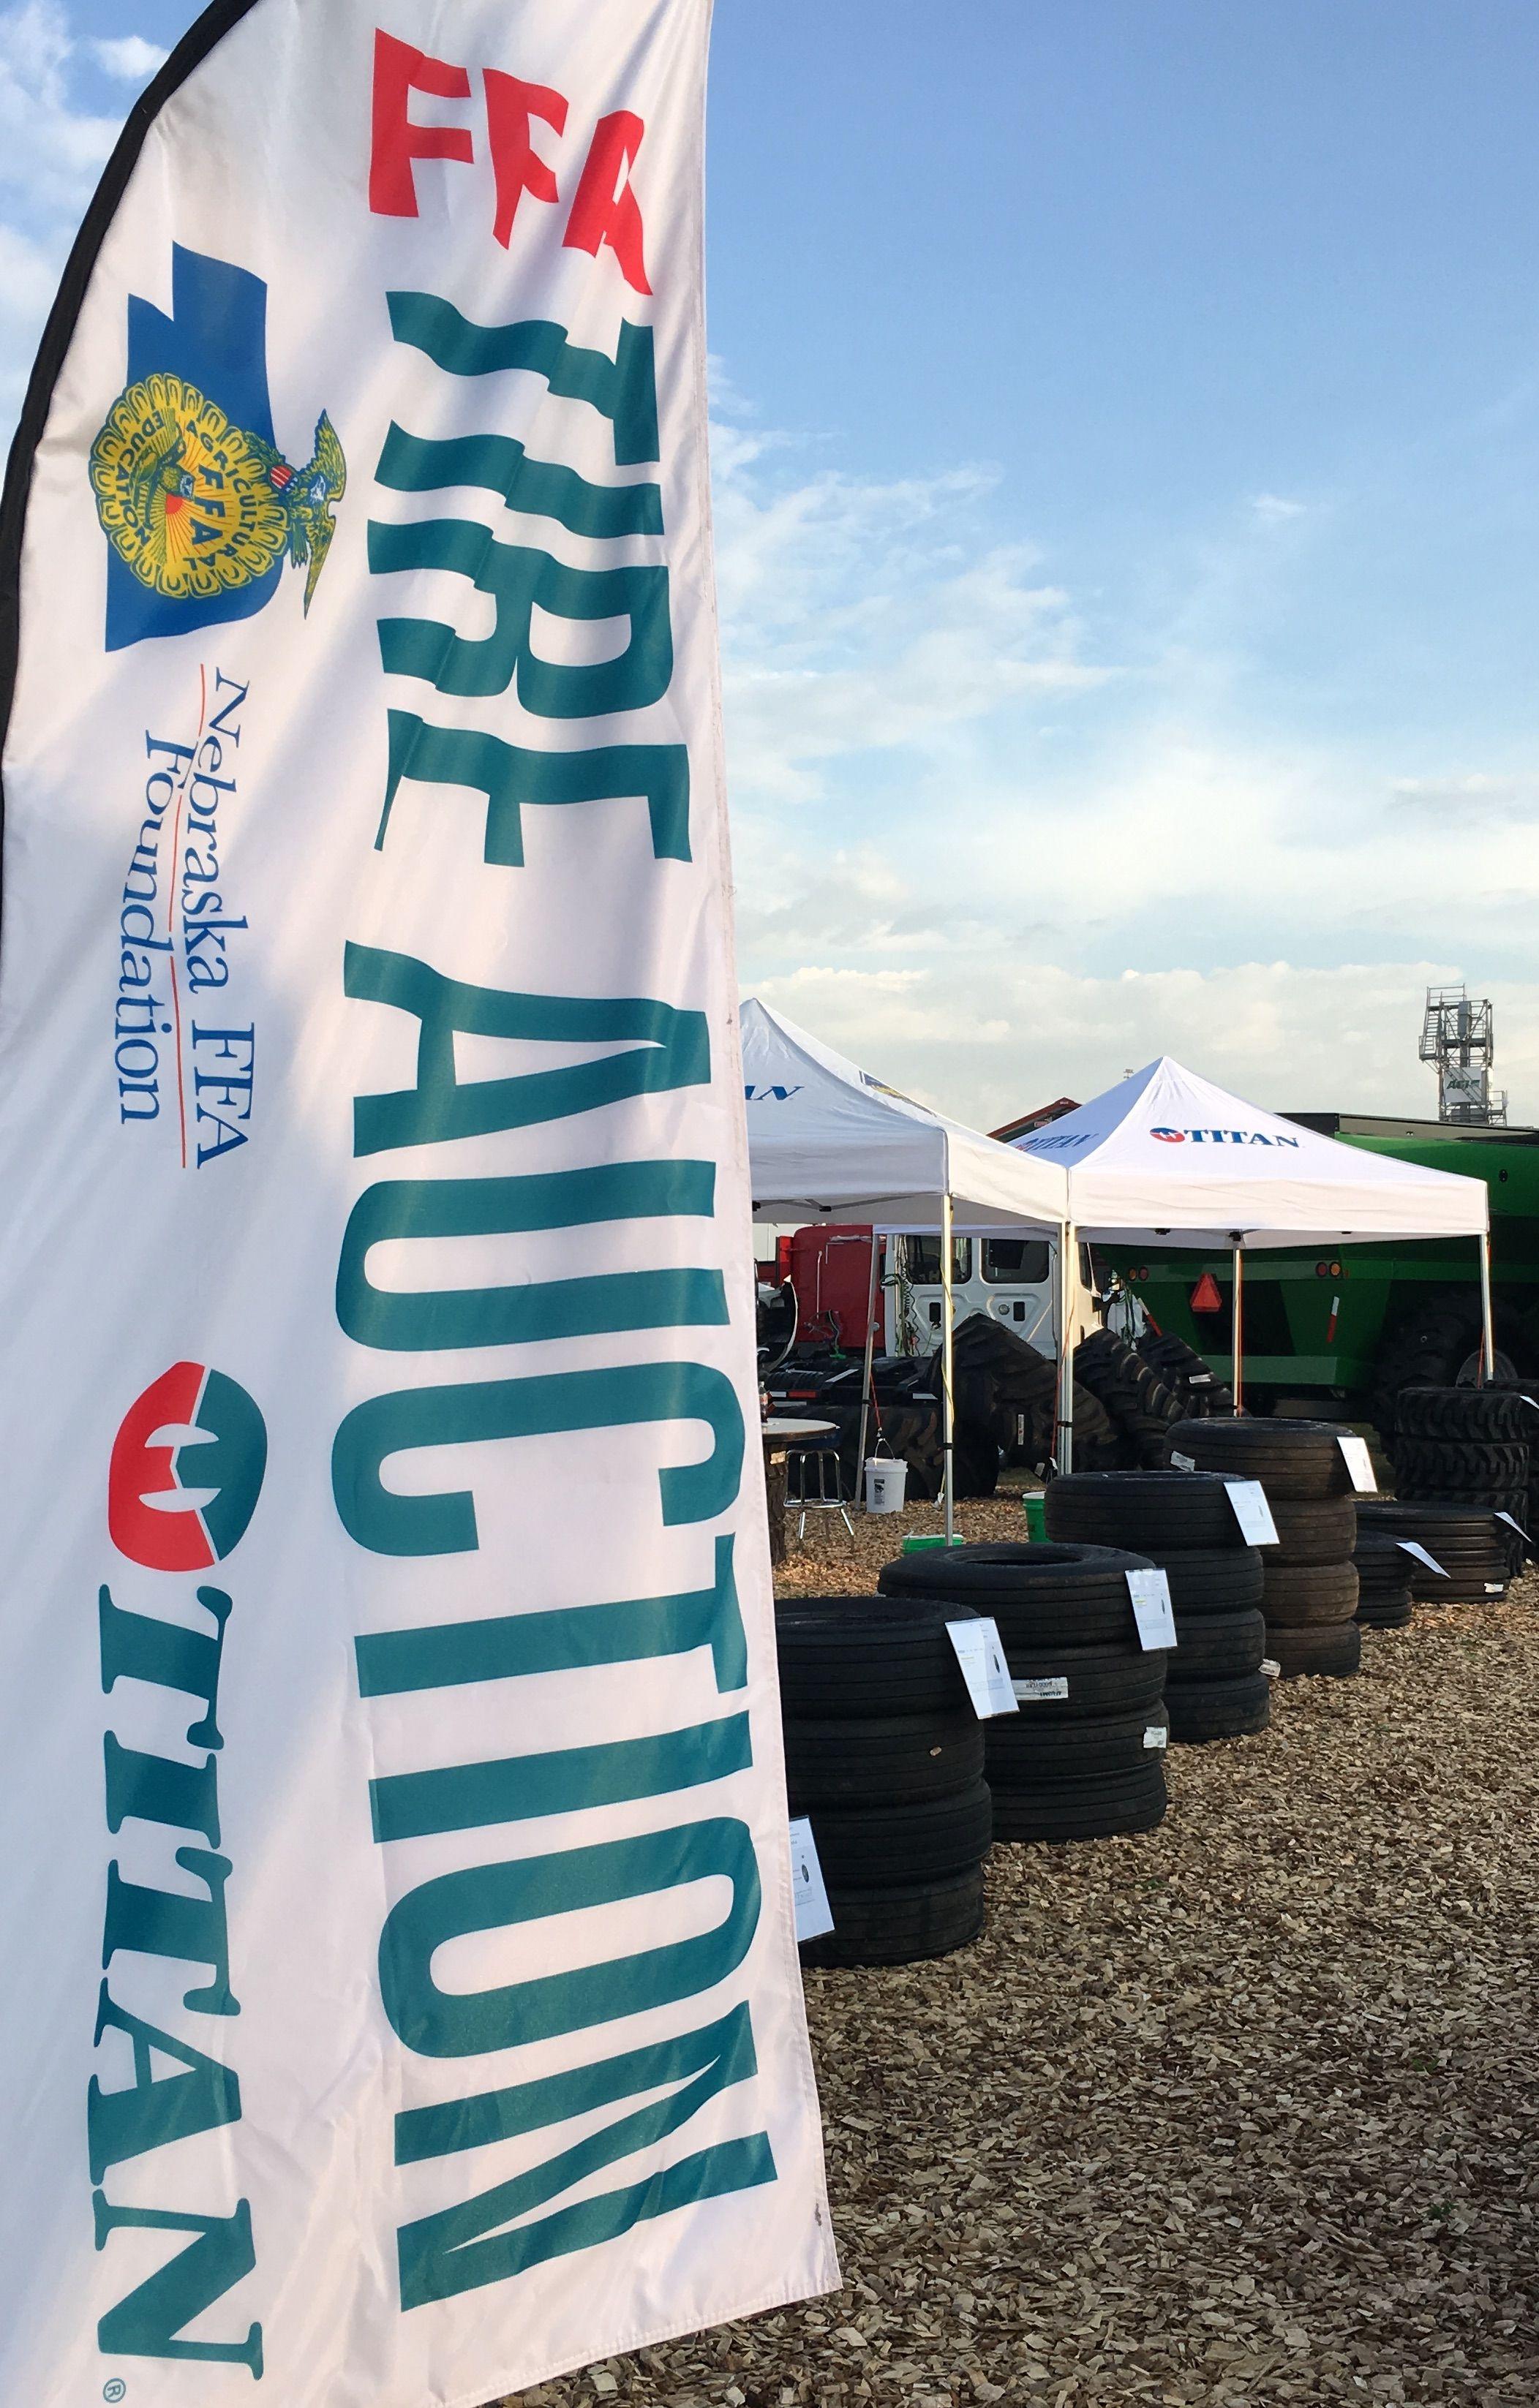 Nebraska FFA Foundation Auction includes tires and John Deere gator